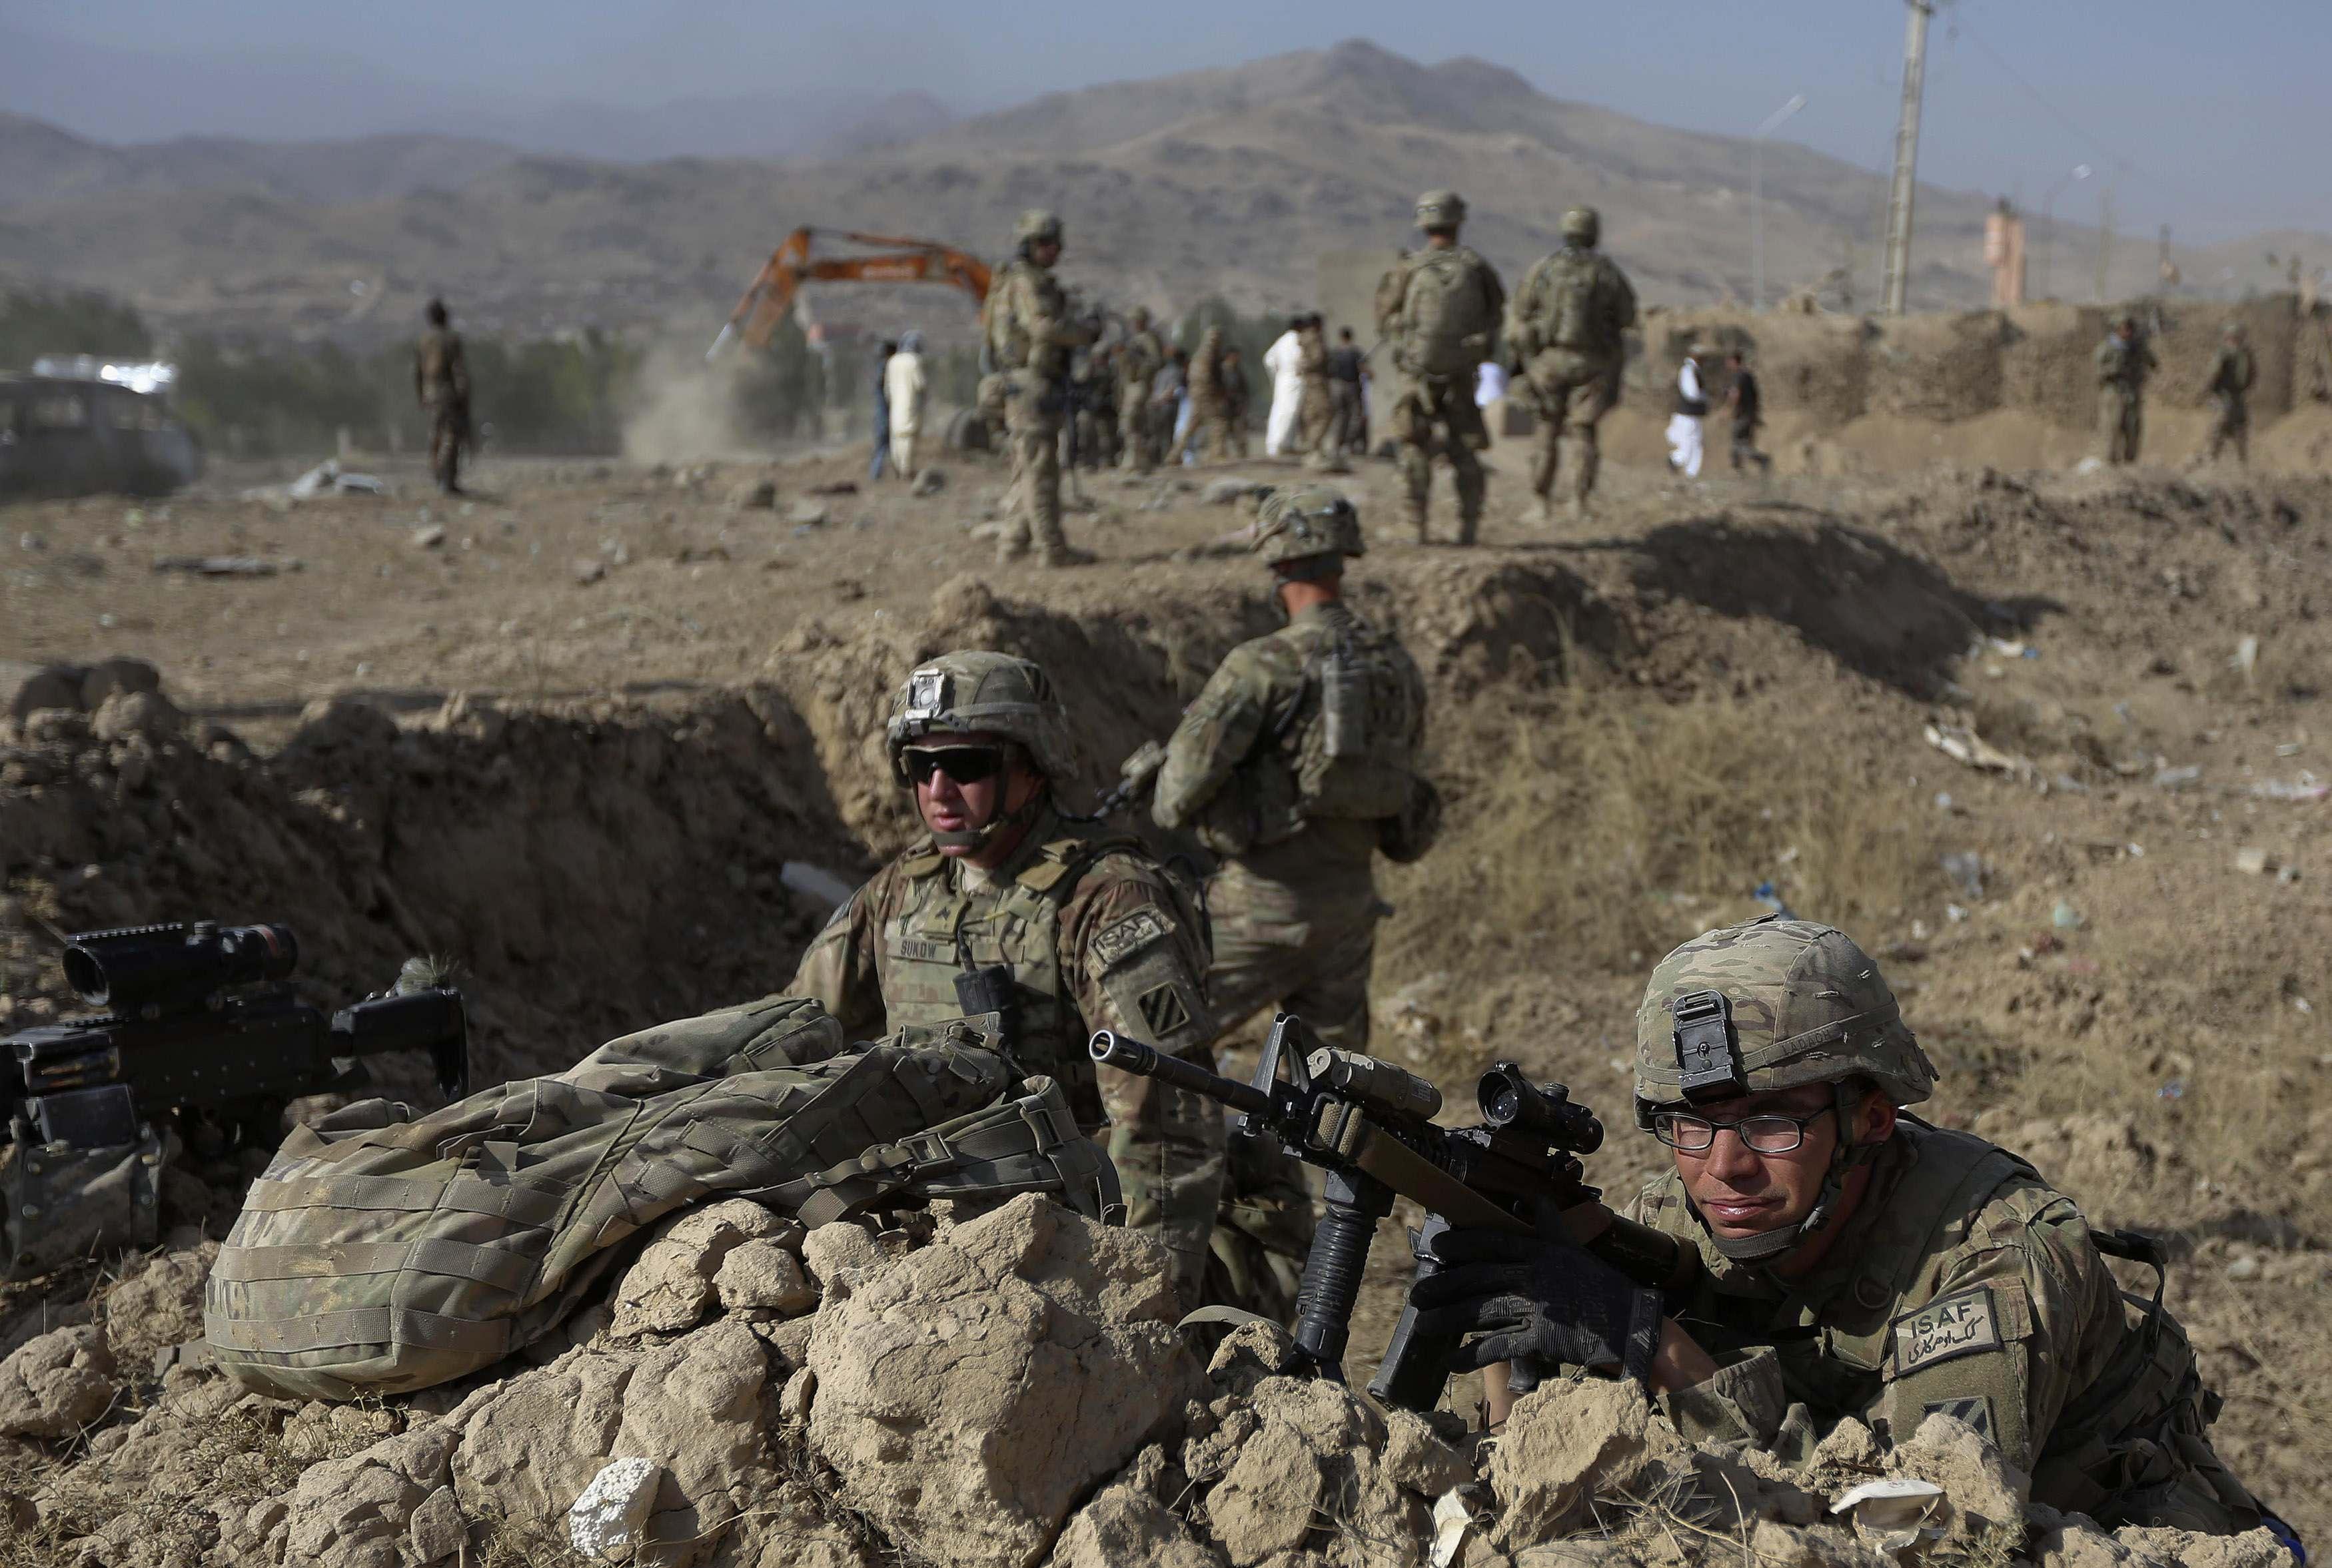 nat 36 thousand u s troops - HD3500×2354